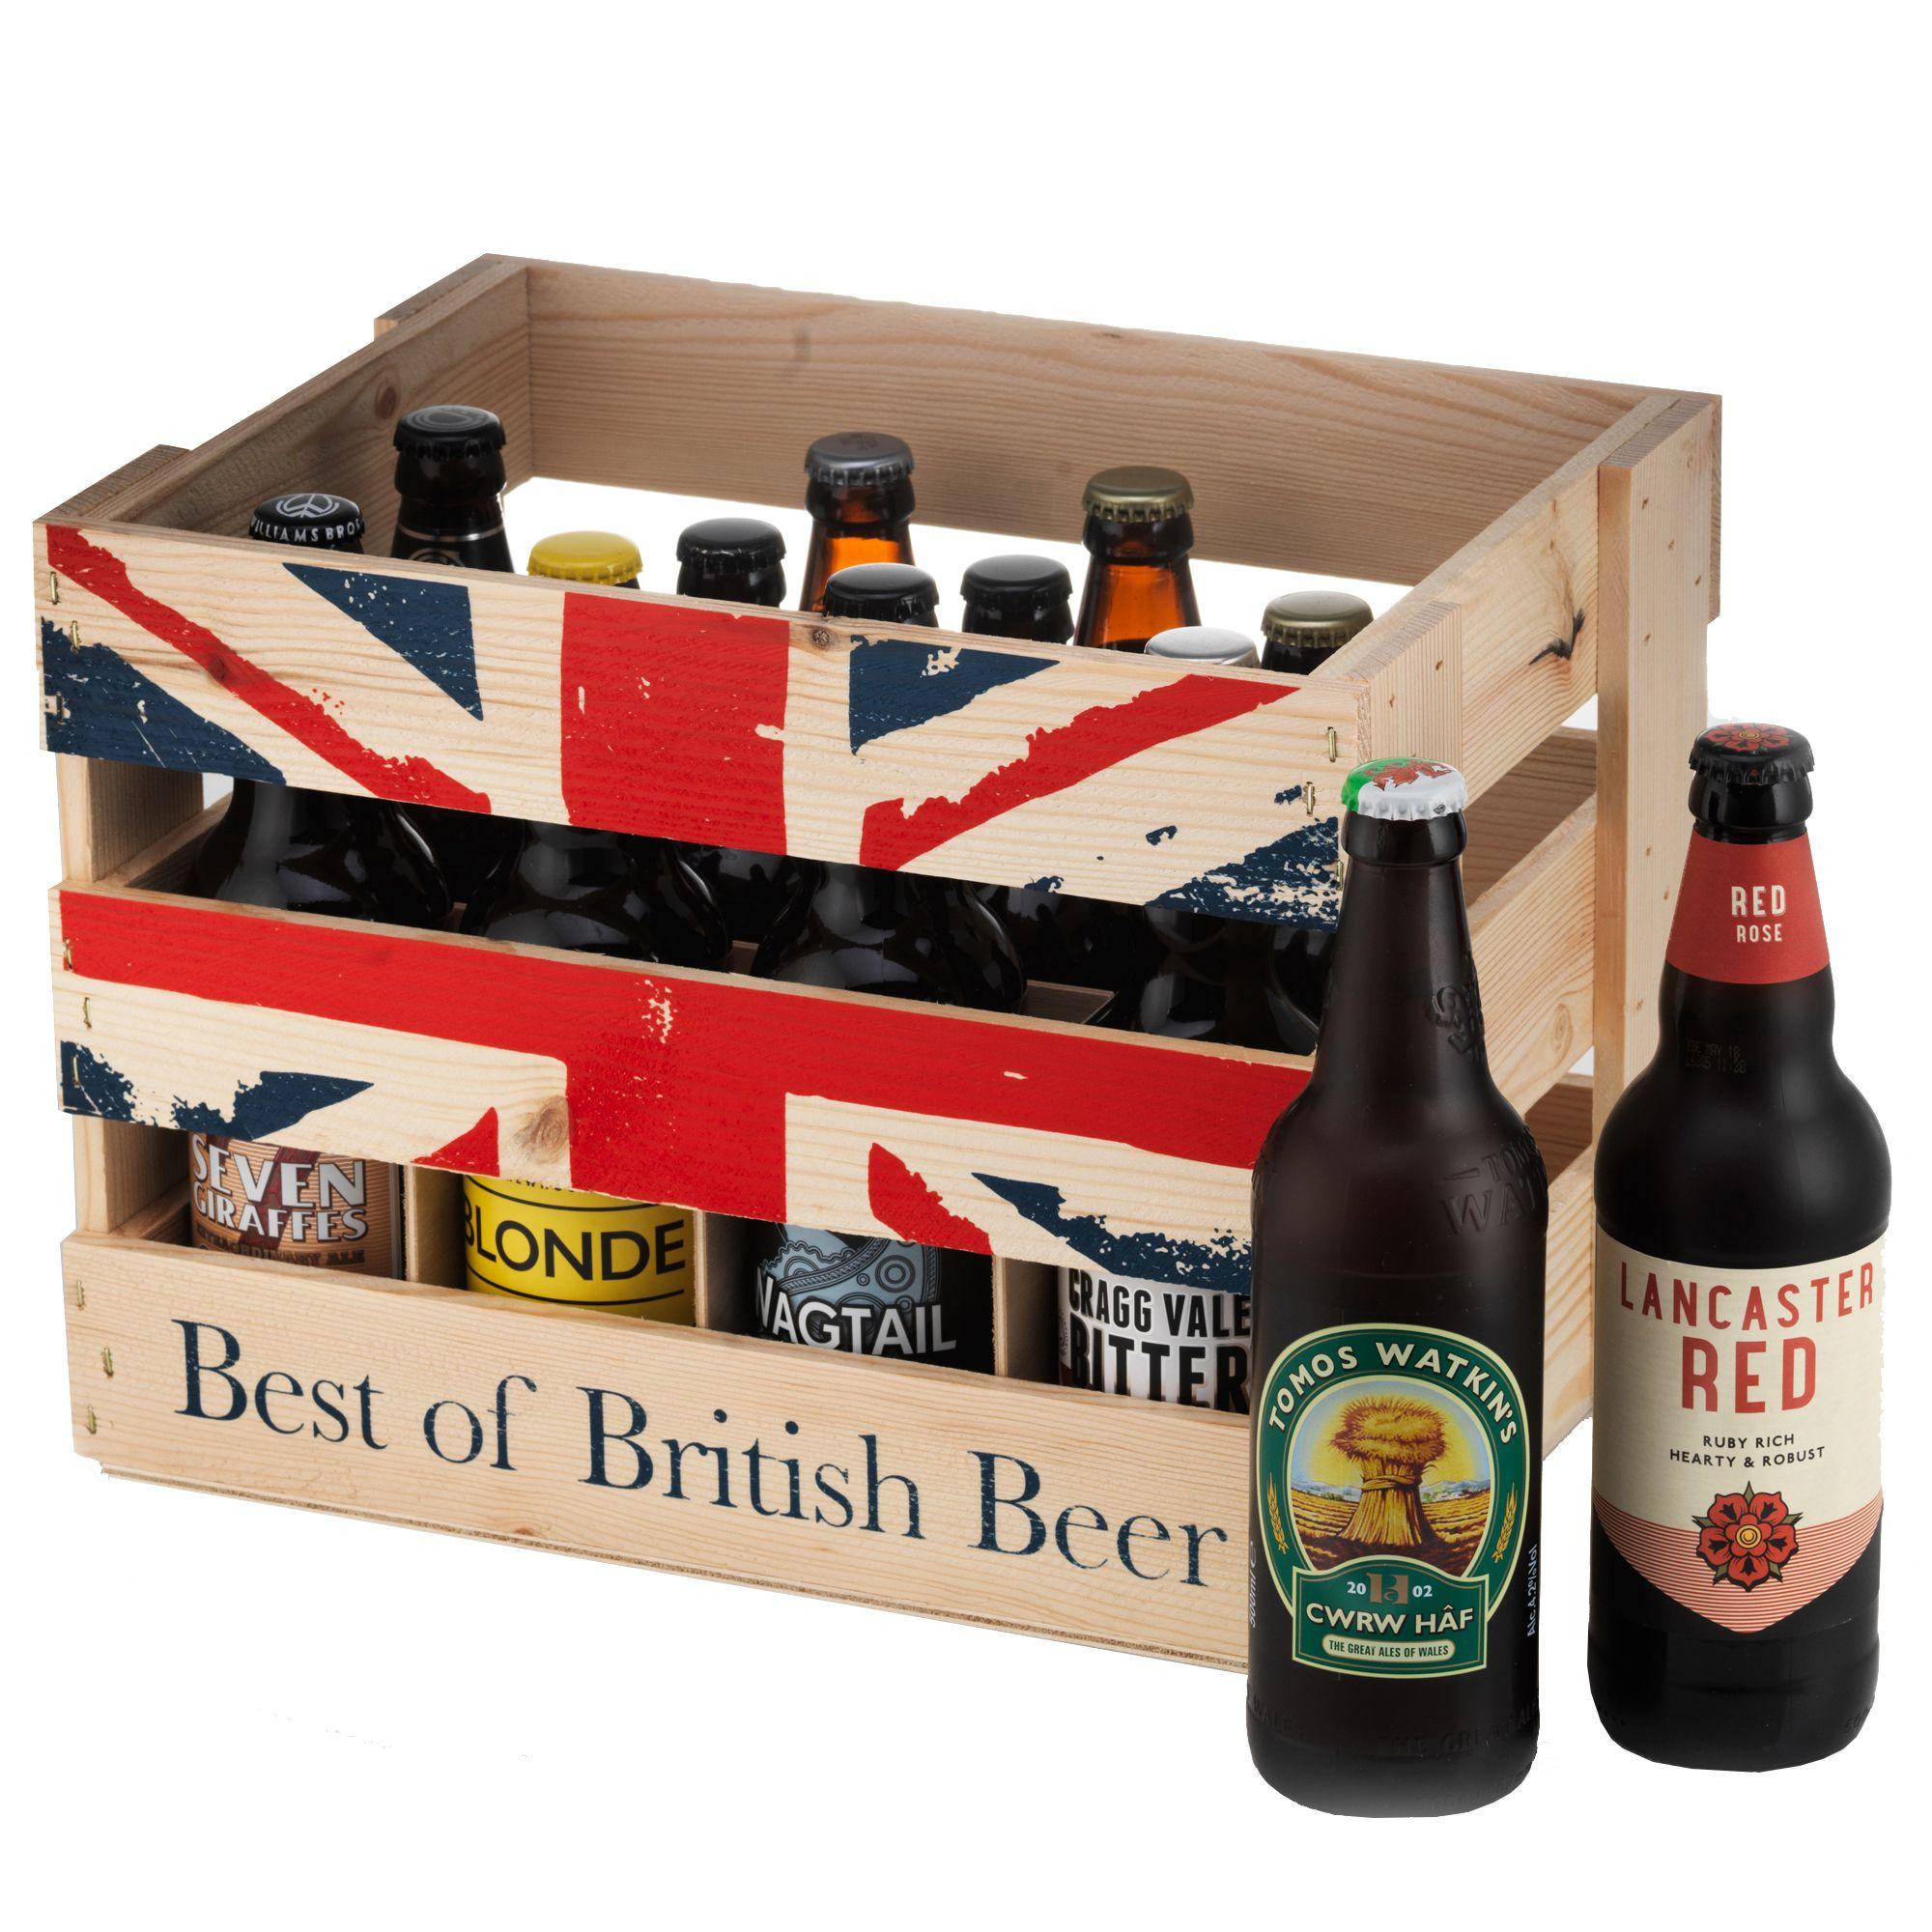 Image of Best of British Beer Crate x12